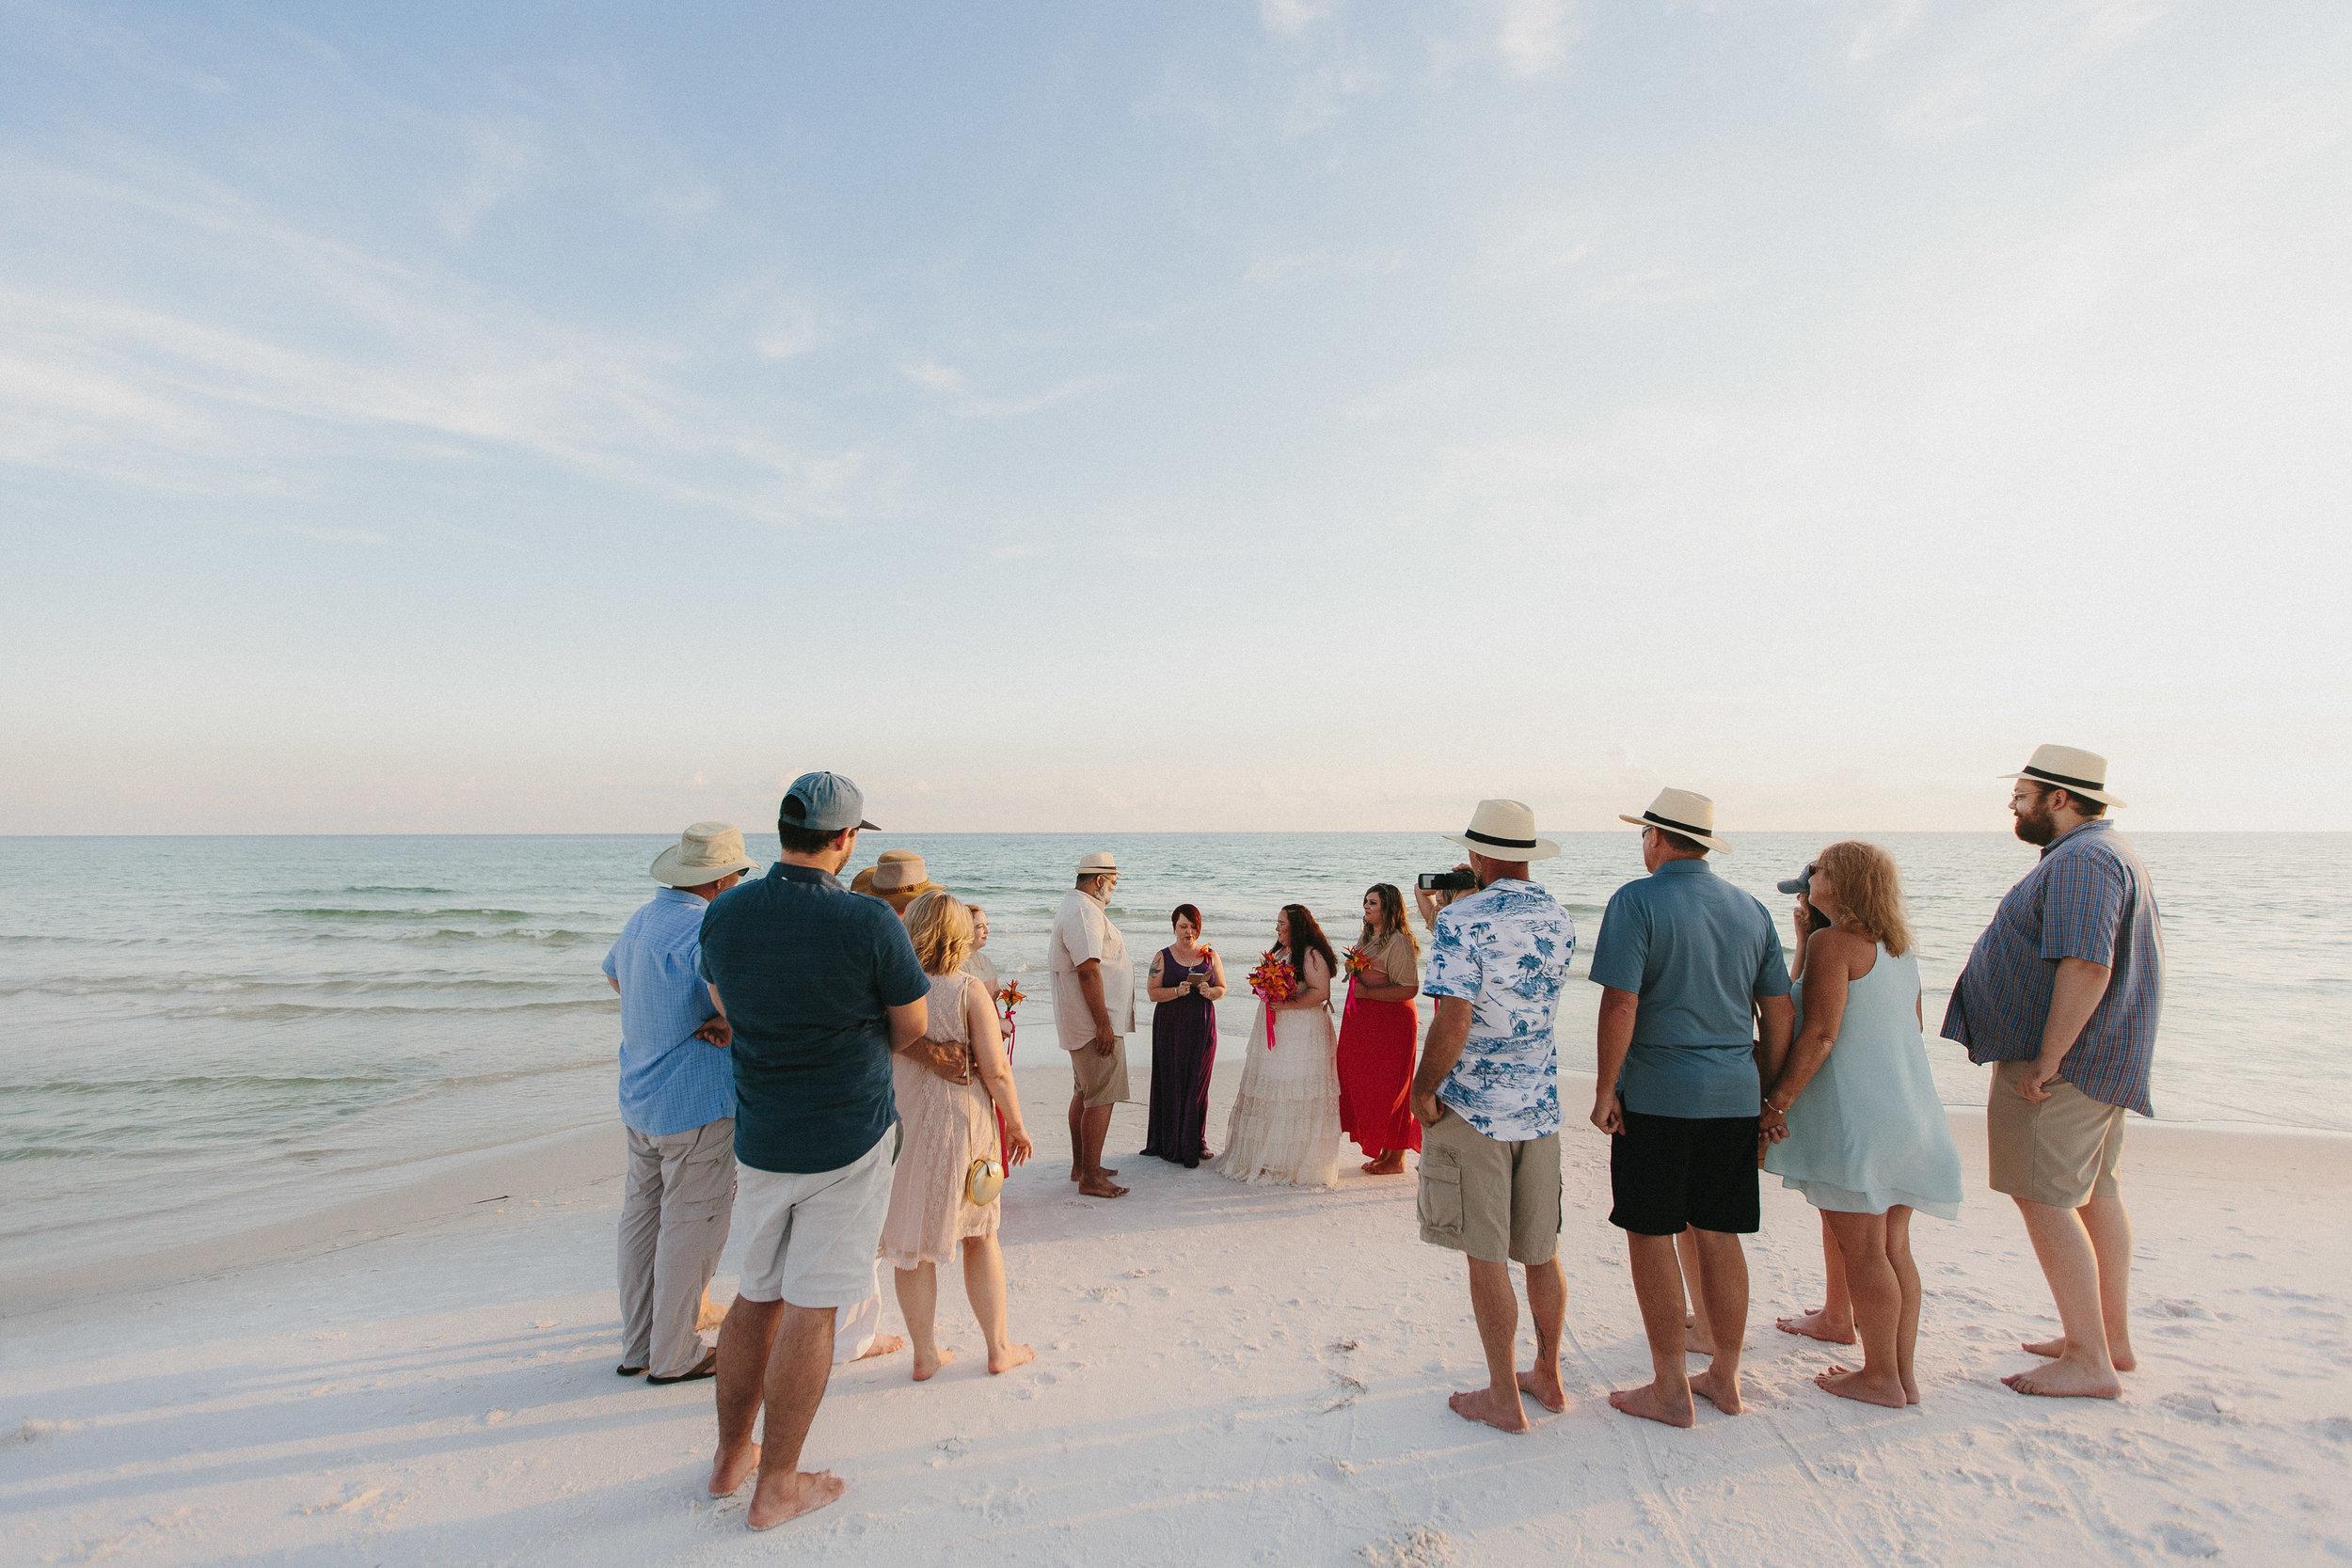 destin_sunset_beach_elopement_intimate_wedding_photographer_florida_documentary_1155.jpg